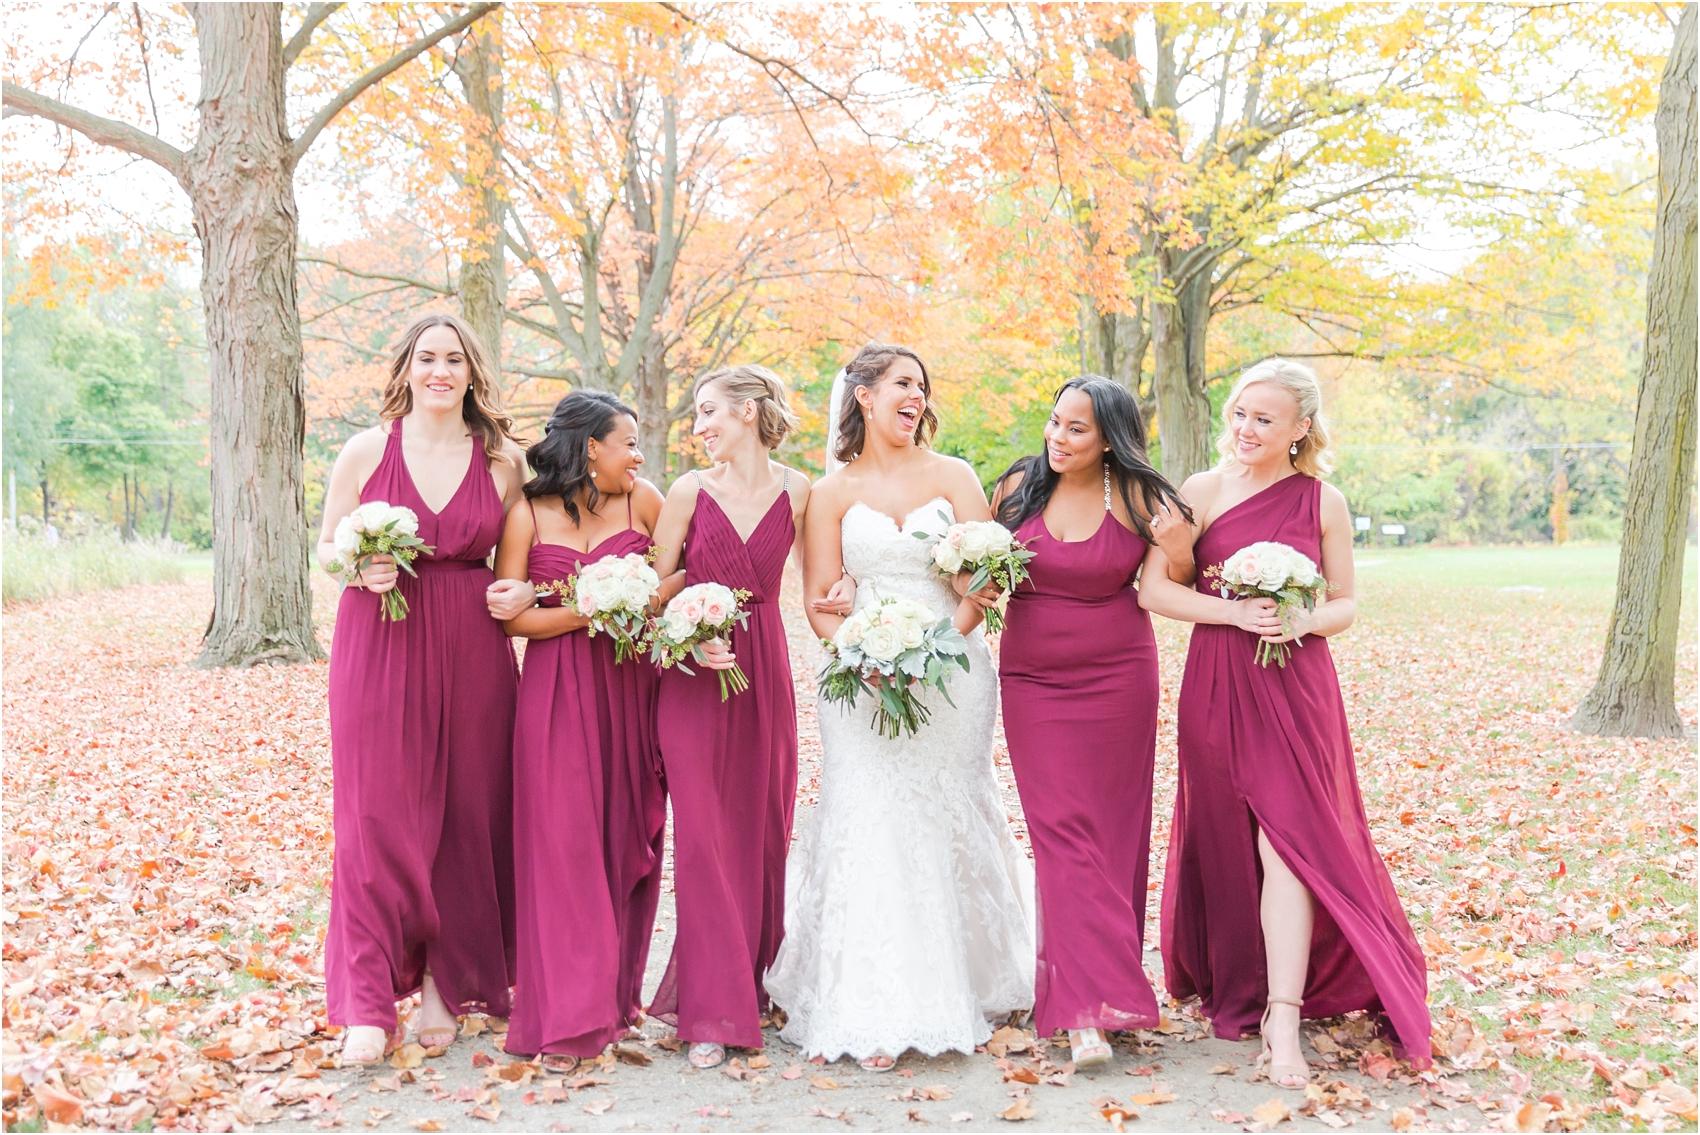 elegant-and-romantic-fall-wedding-photos-at-st-marys-catholic-church-in-monroe-michigan-by-courtney-carolyn-photography_0058.jpg